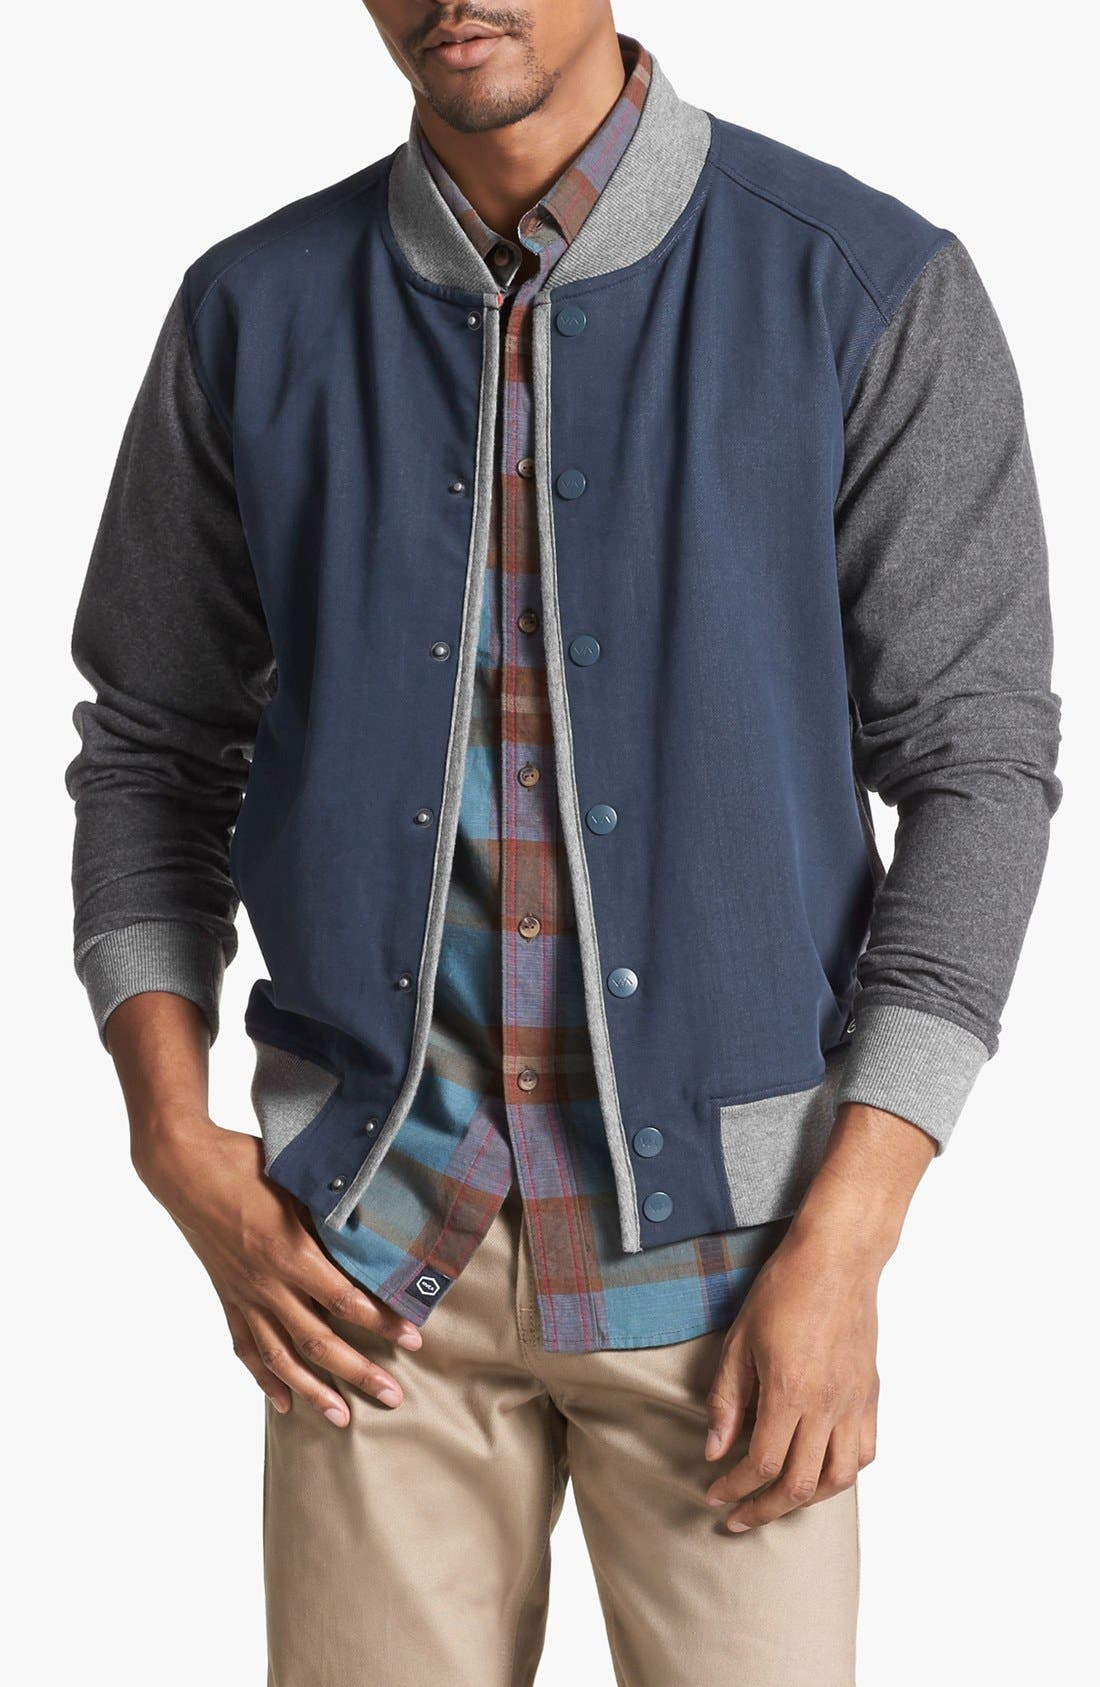 Alternate Image 1 Selected - RVCA 'Hatcher' Varsity Jacket